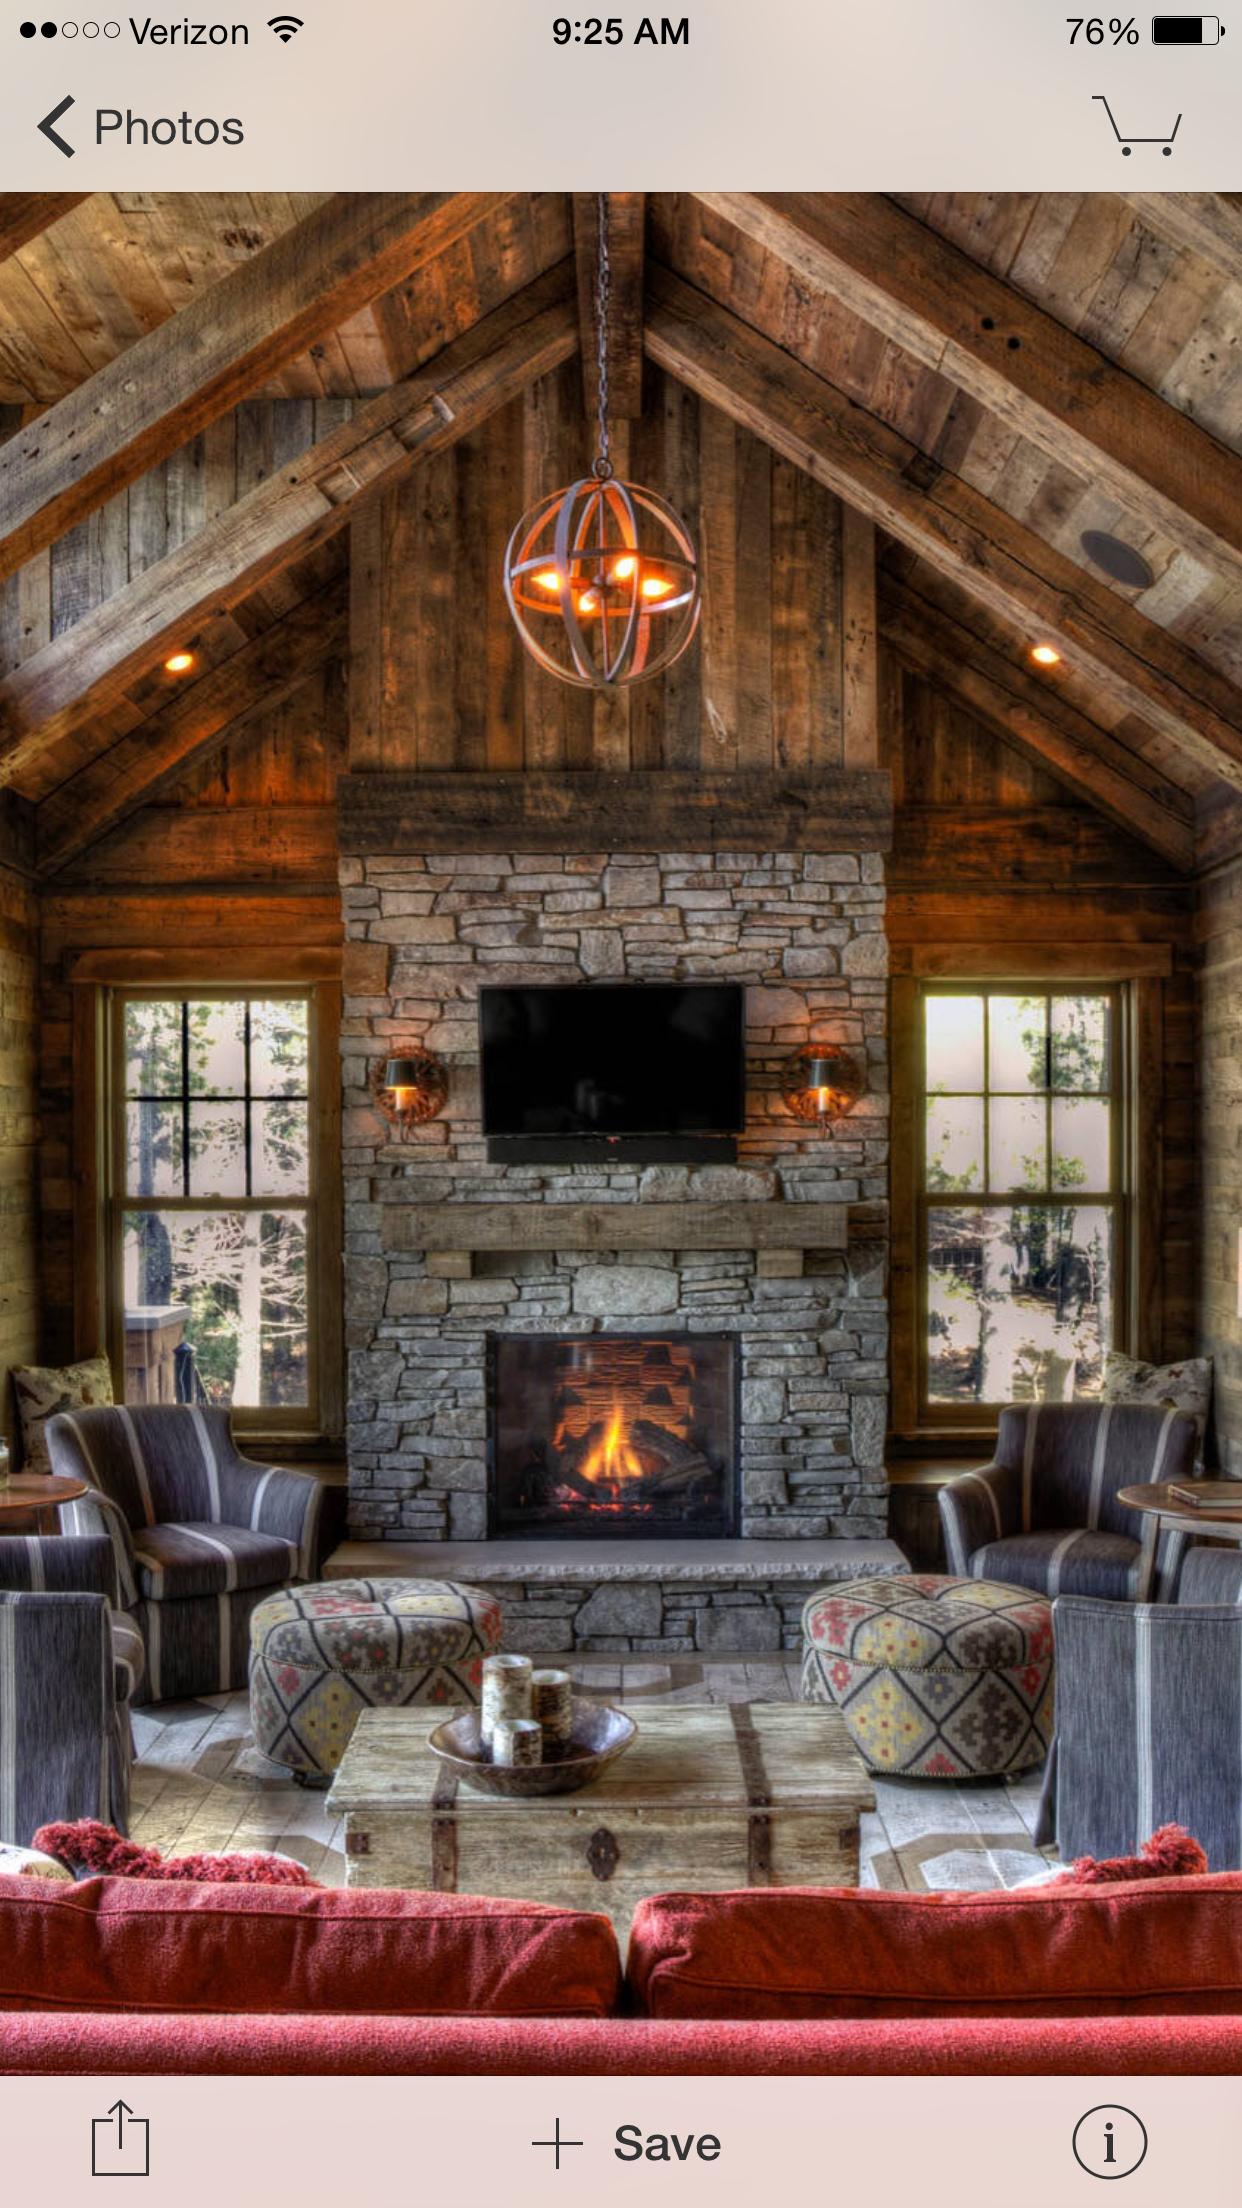 Beaiutiful timber frame home